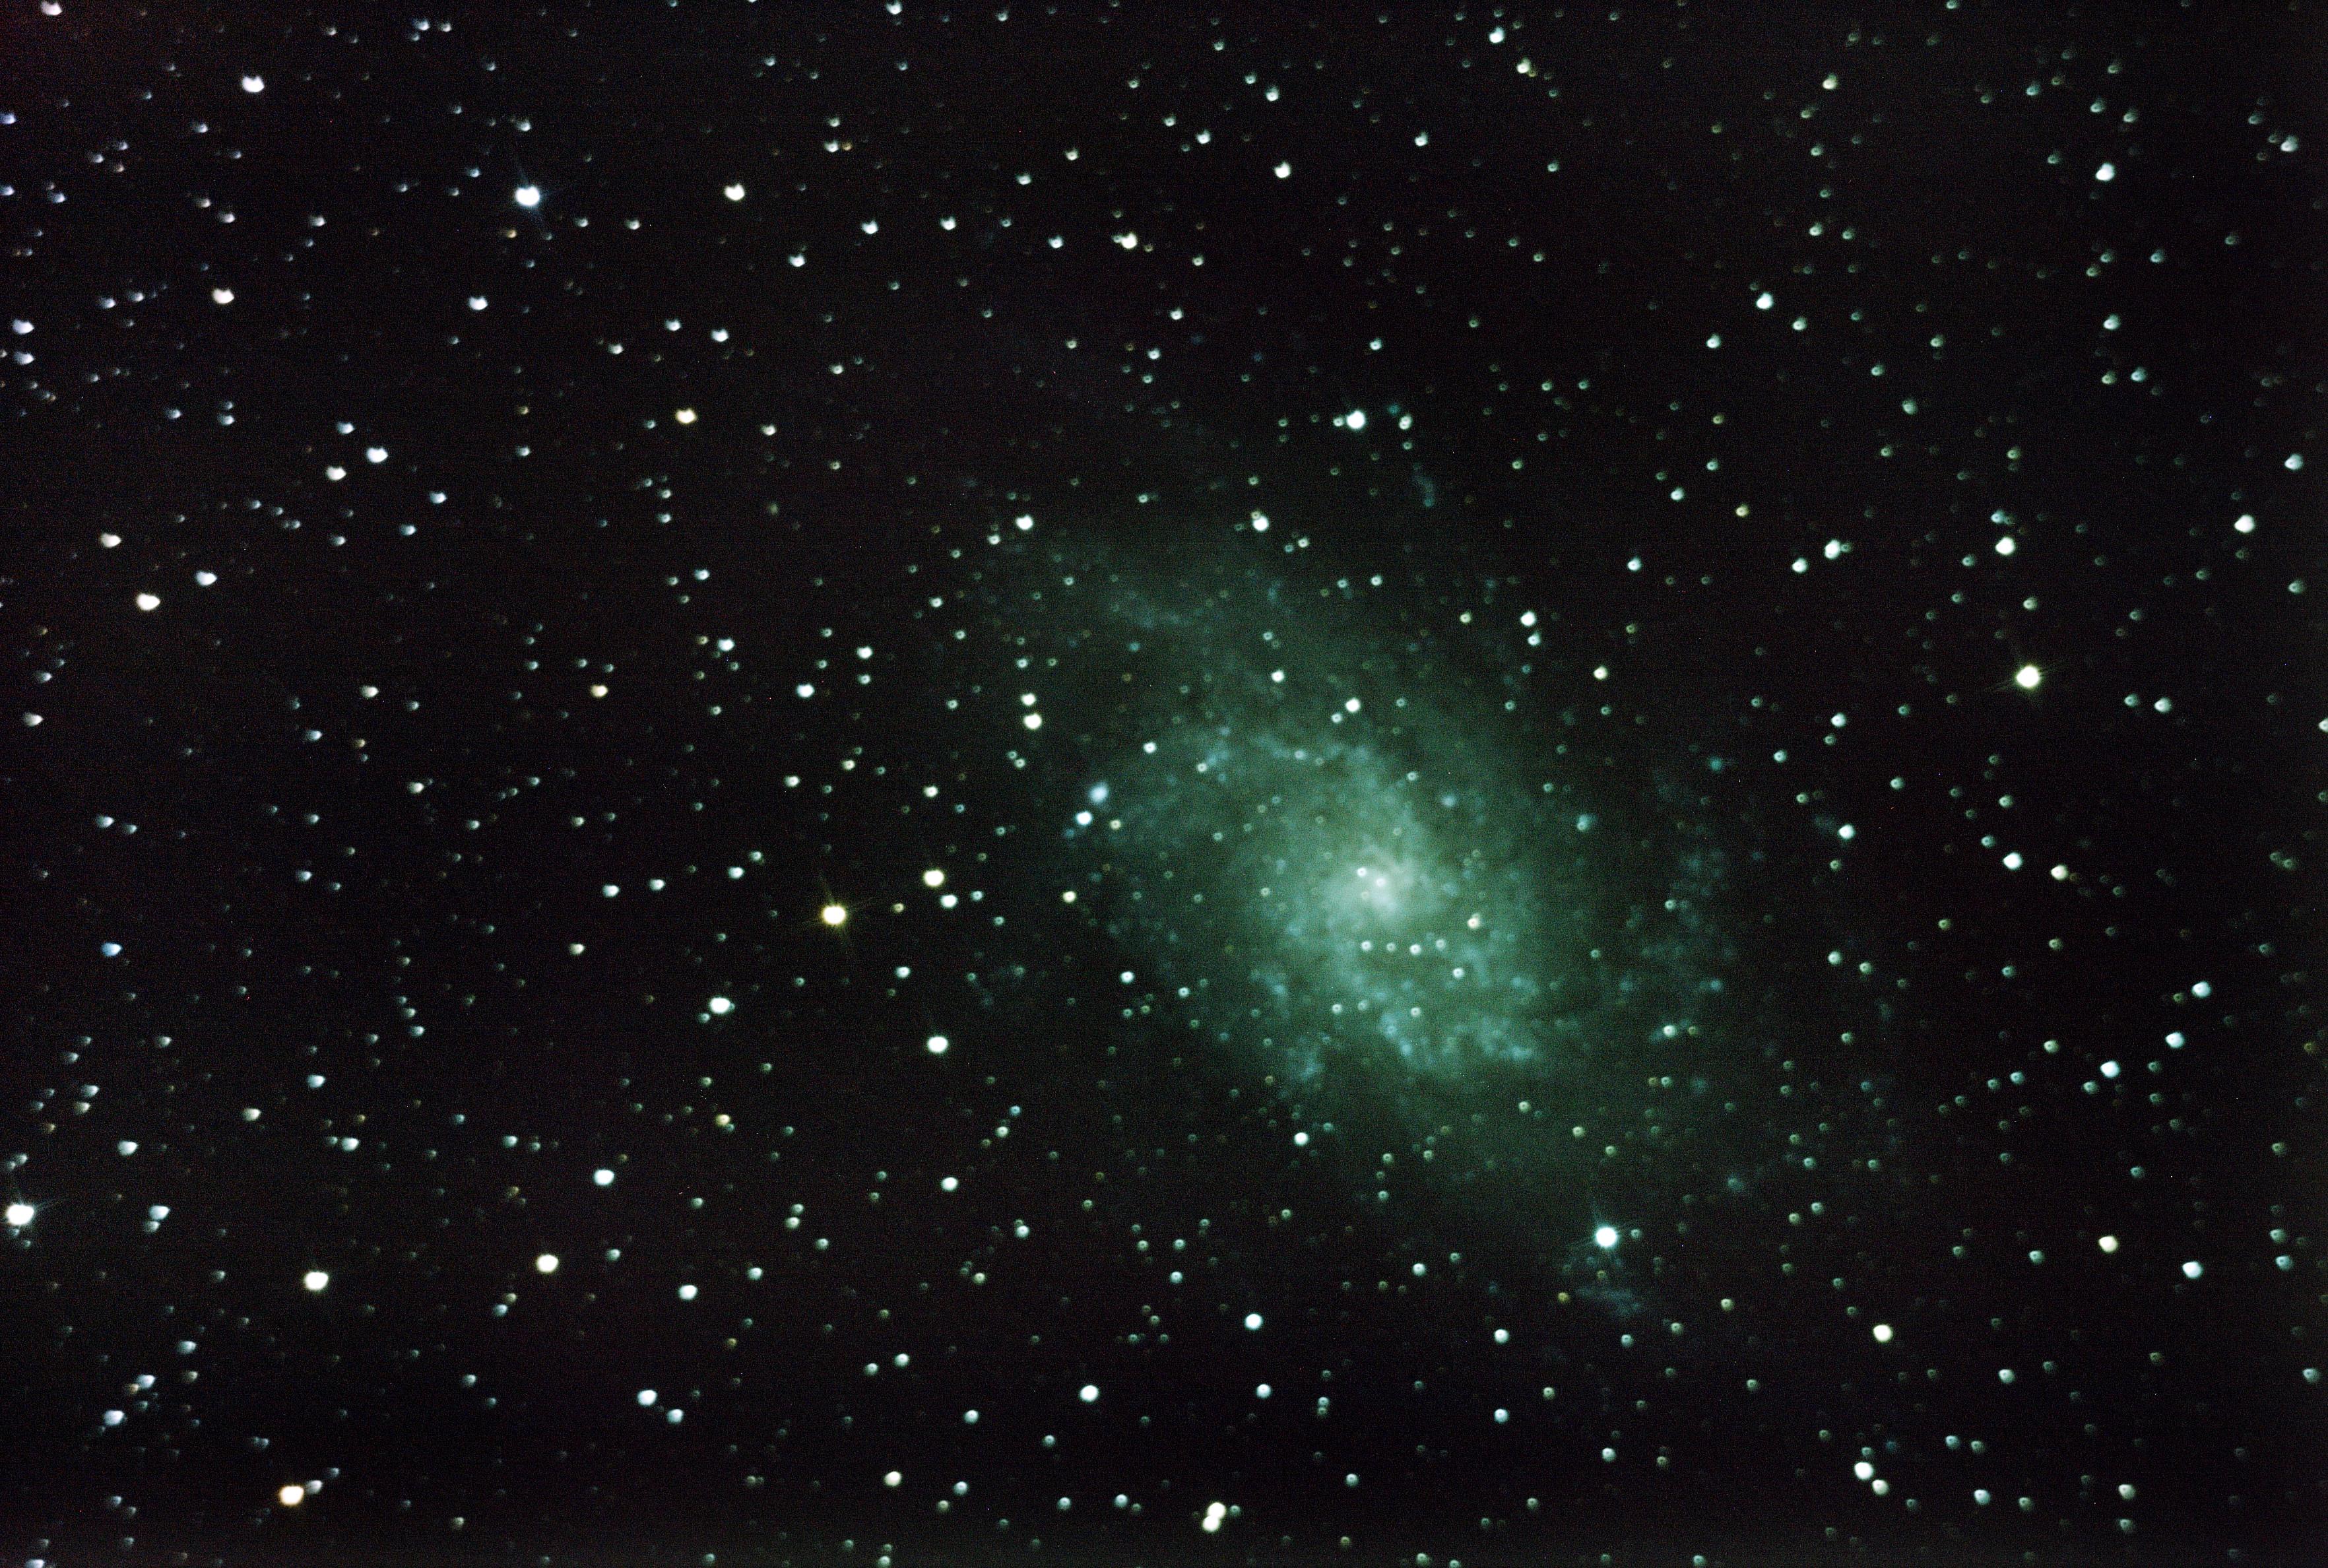 M33, La Galaxie du Triangle M33a0010r